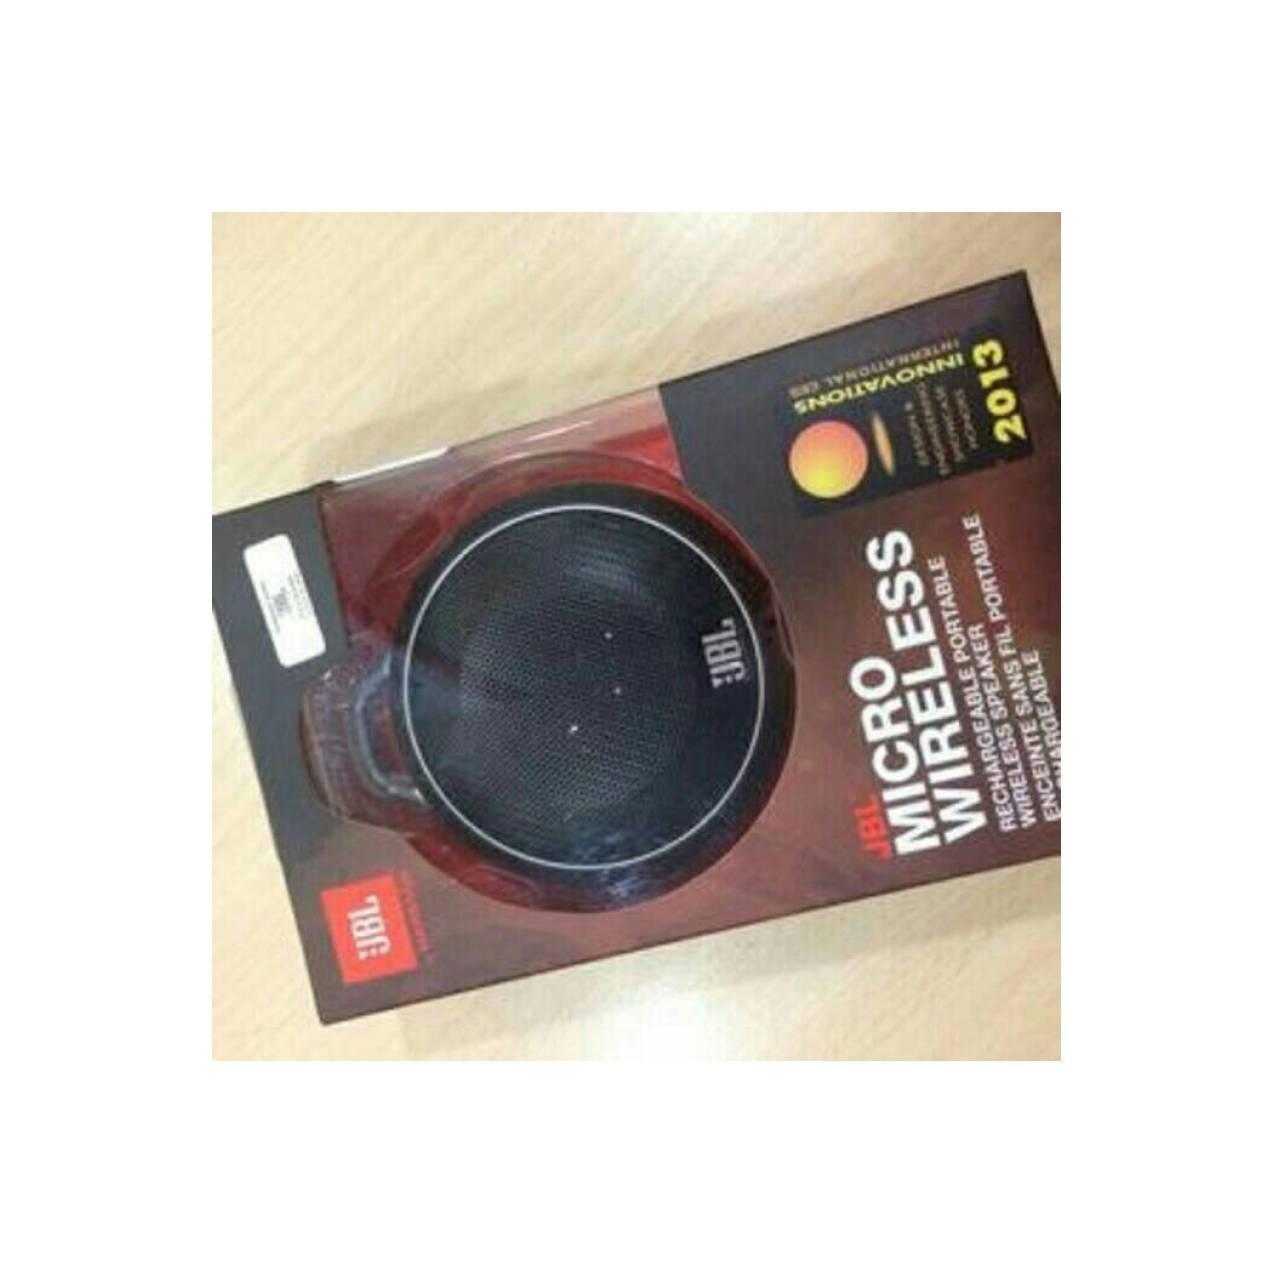 Klik Harga Pas Terjangkau Part 859 Samsung Galaxy Ace4 Lte Free Memory Card 8gb Clearance  Hitam Mini Speaker Bluetooth Portable Jbl Micro Wireless Black